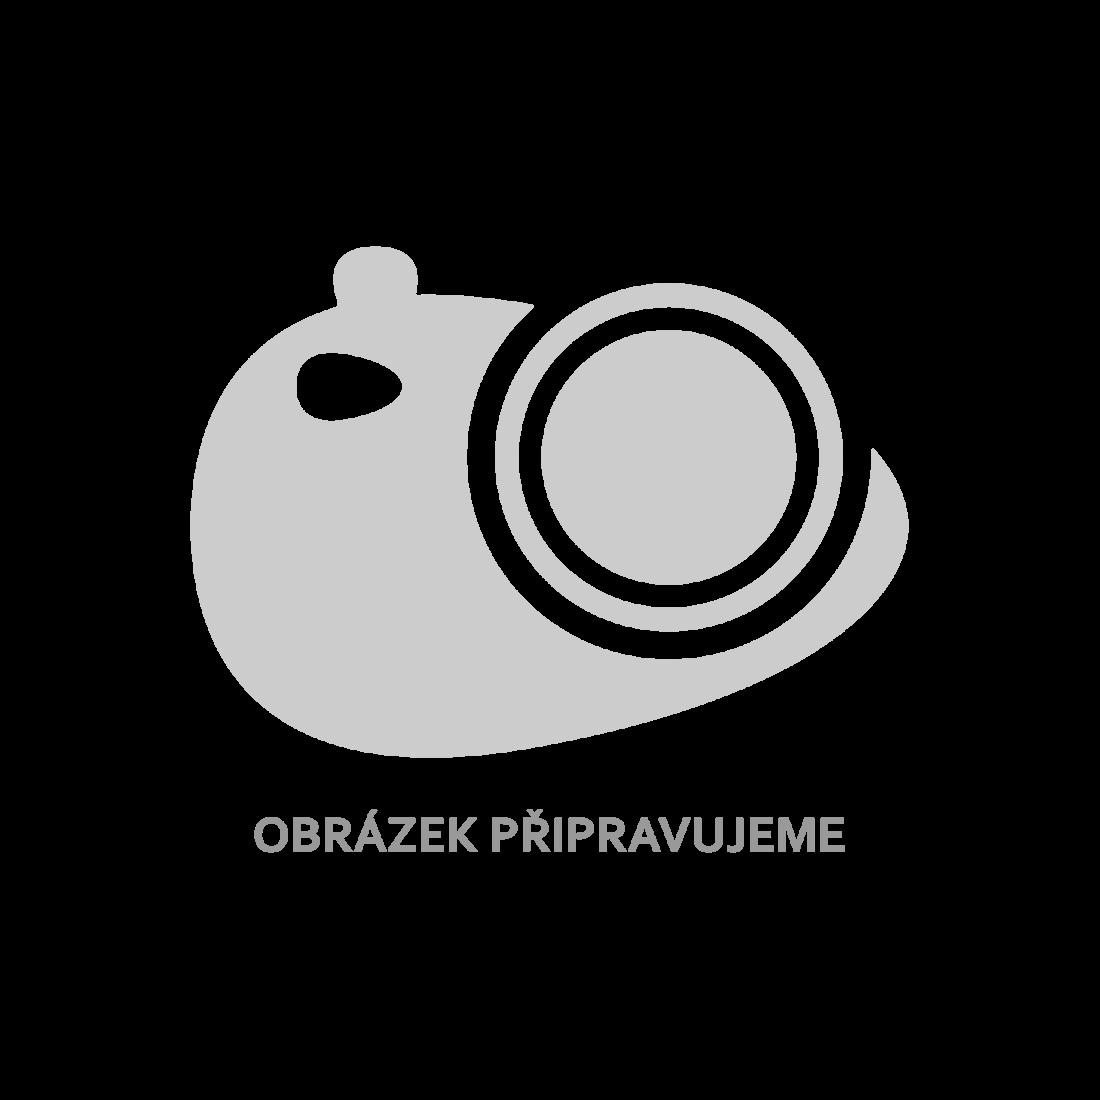 Chovatelské pletivo, 1 x 10 m, pozinkovaný drát 0,75 mm,oka 19 x 19 mm